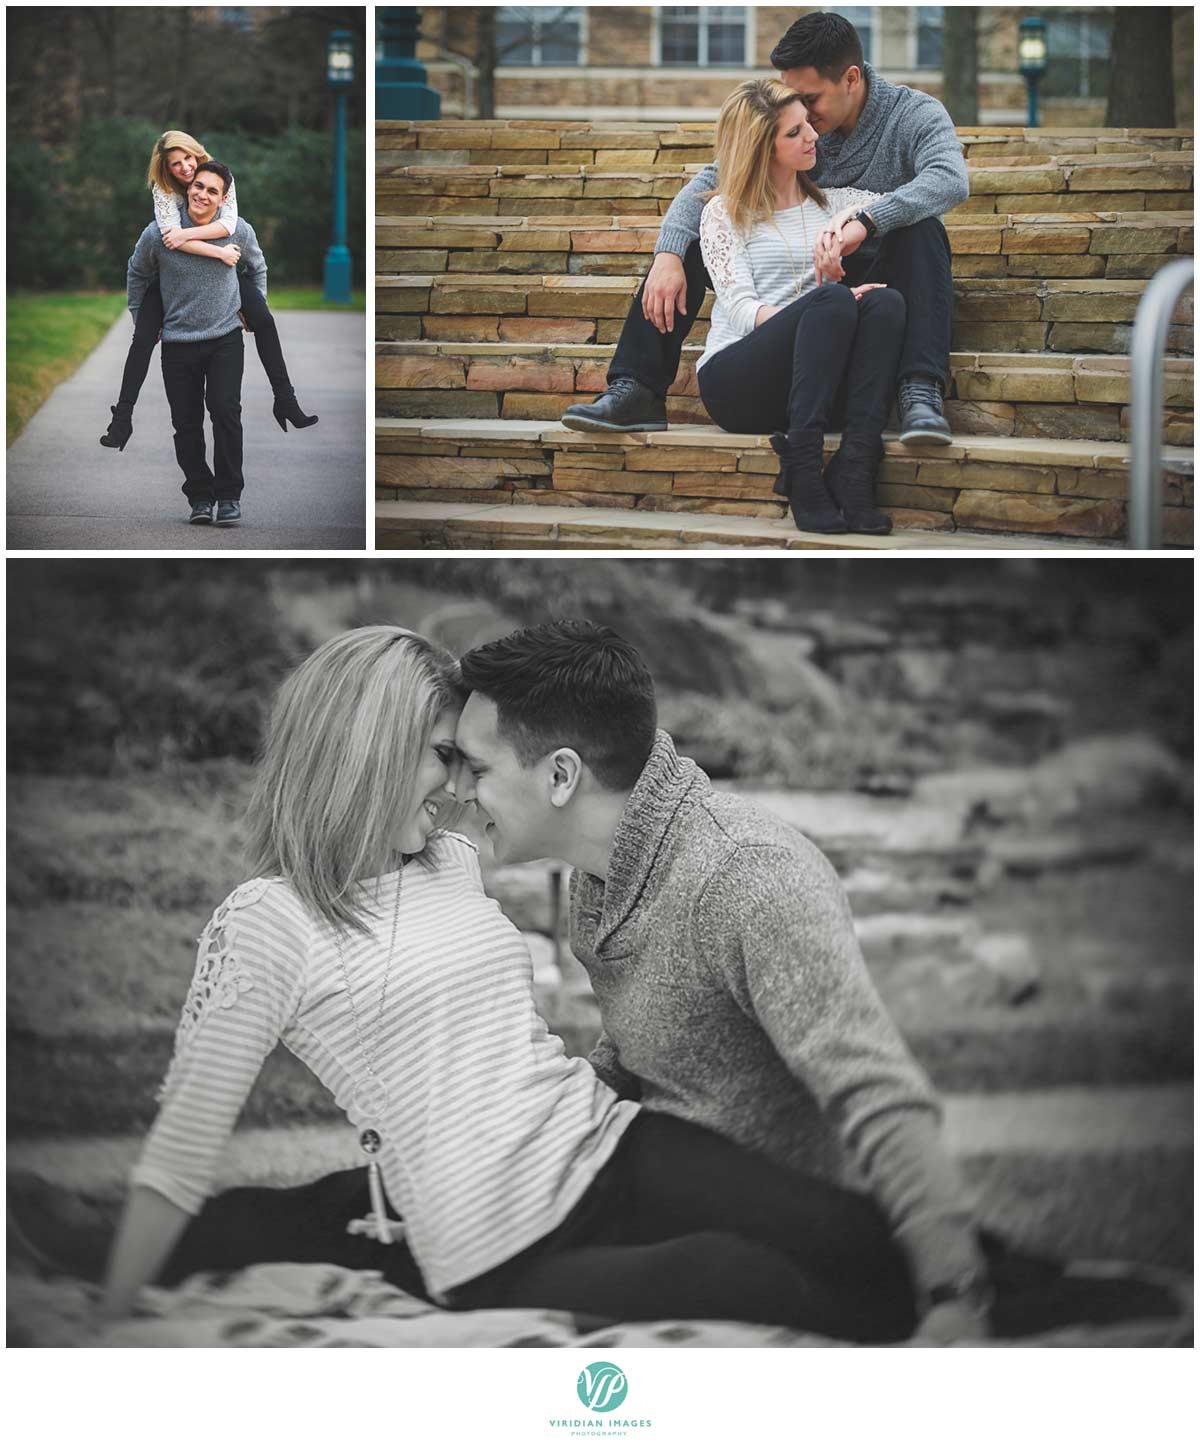 Atlanta_Hyatt_Villa_Christina_Engagement_Viridian_Images_Photography_photo-9